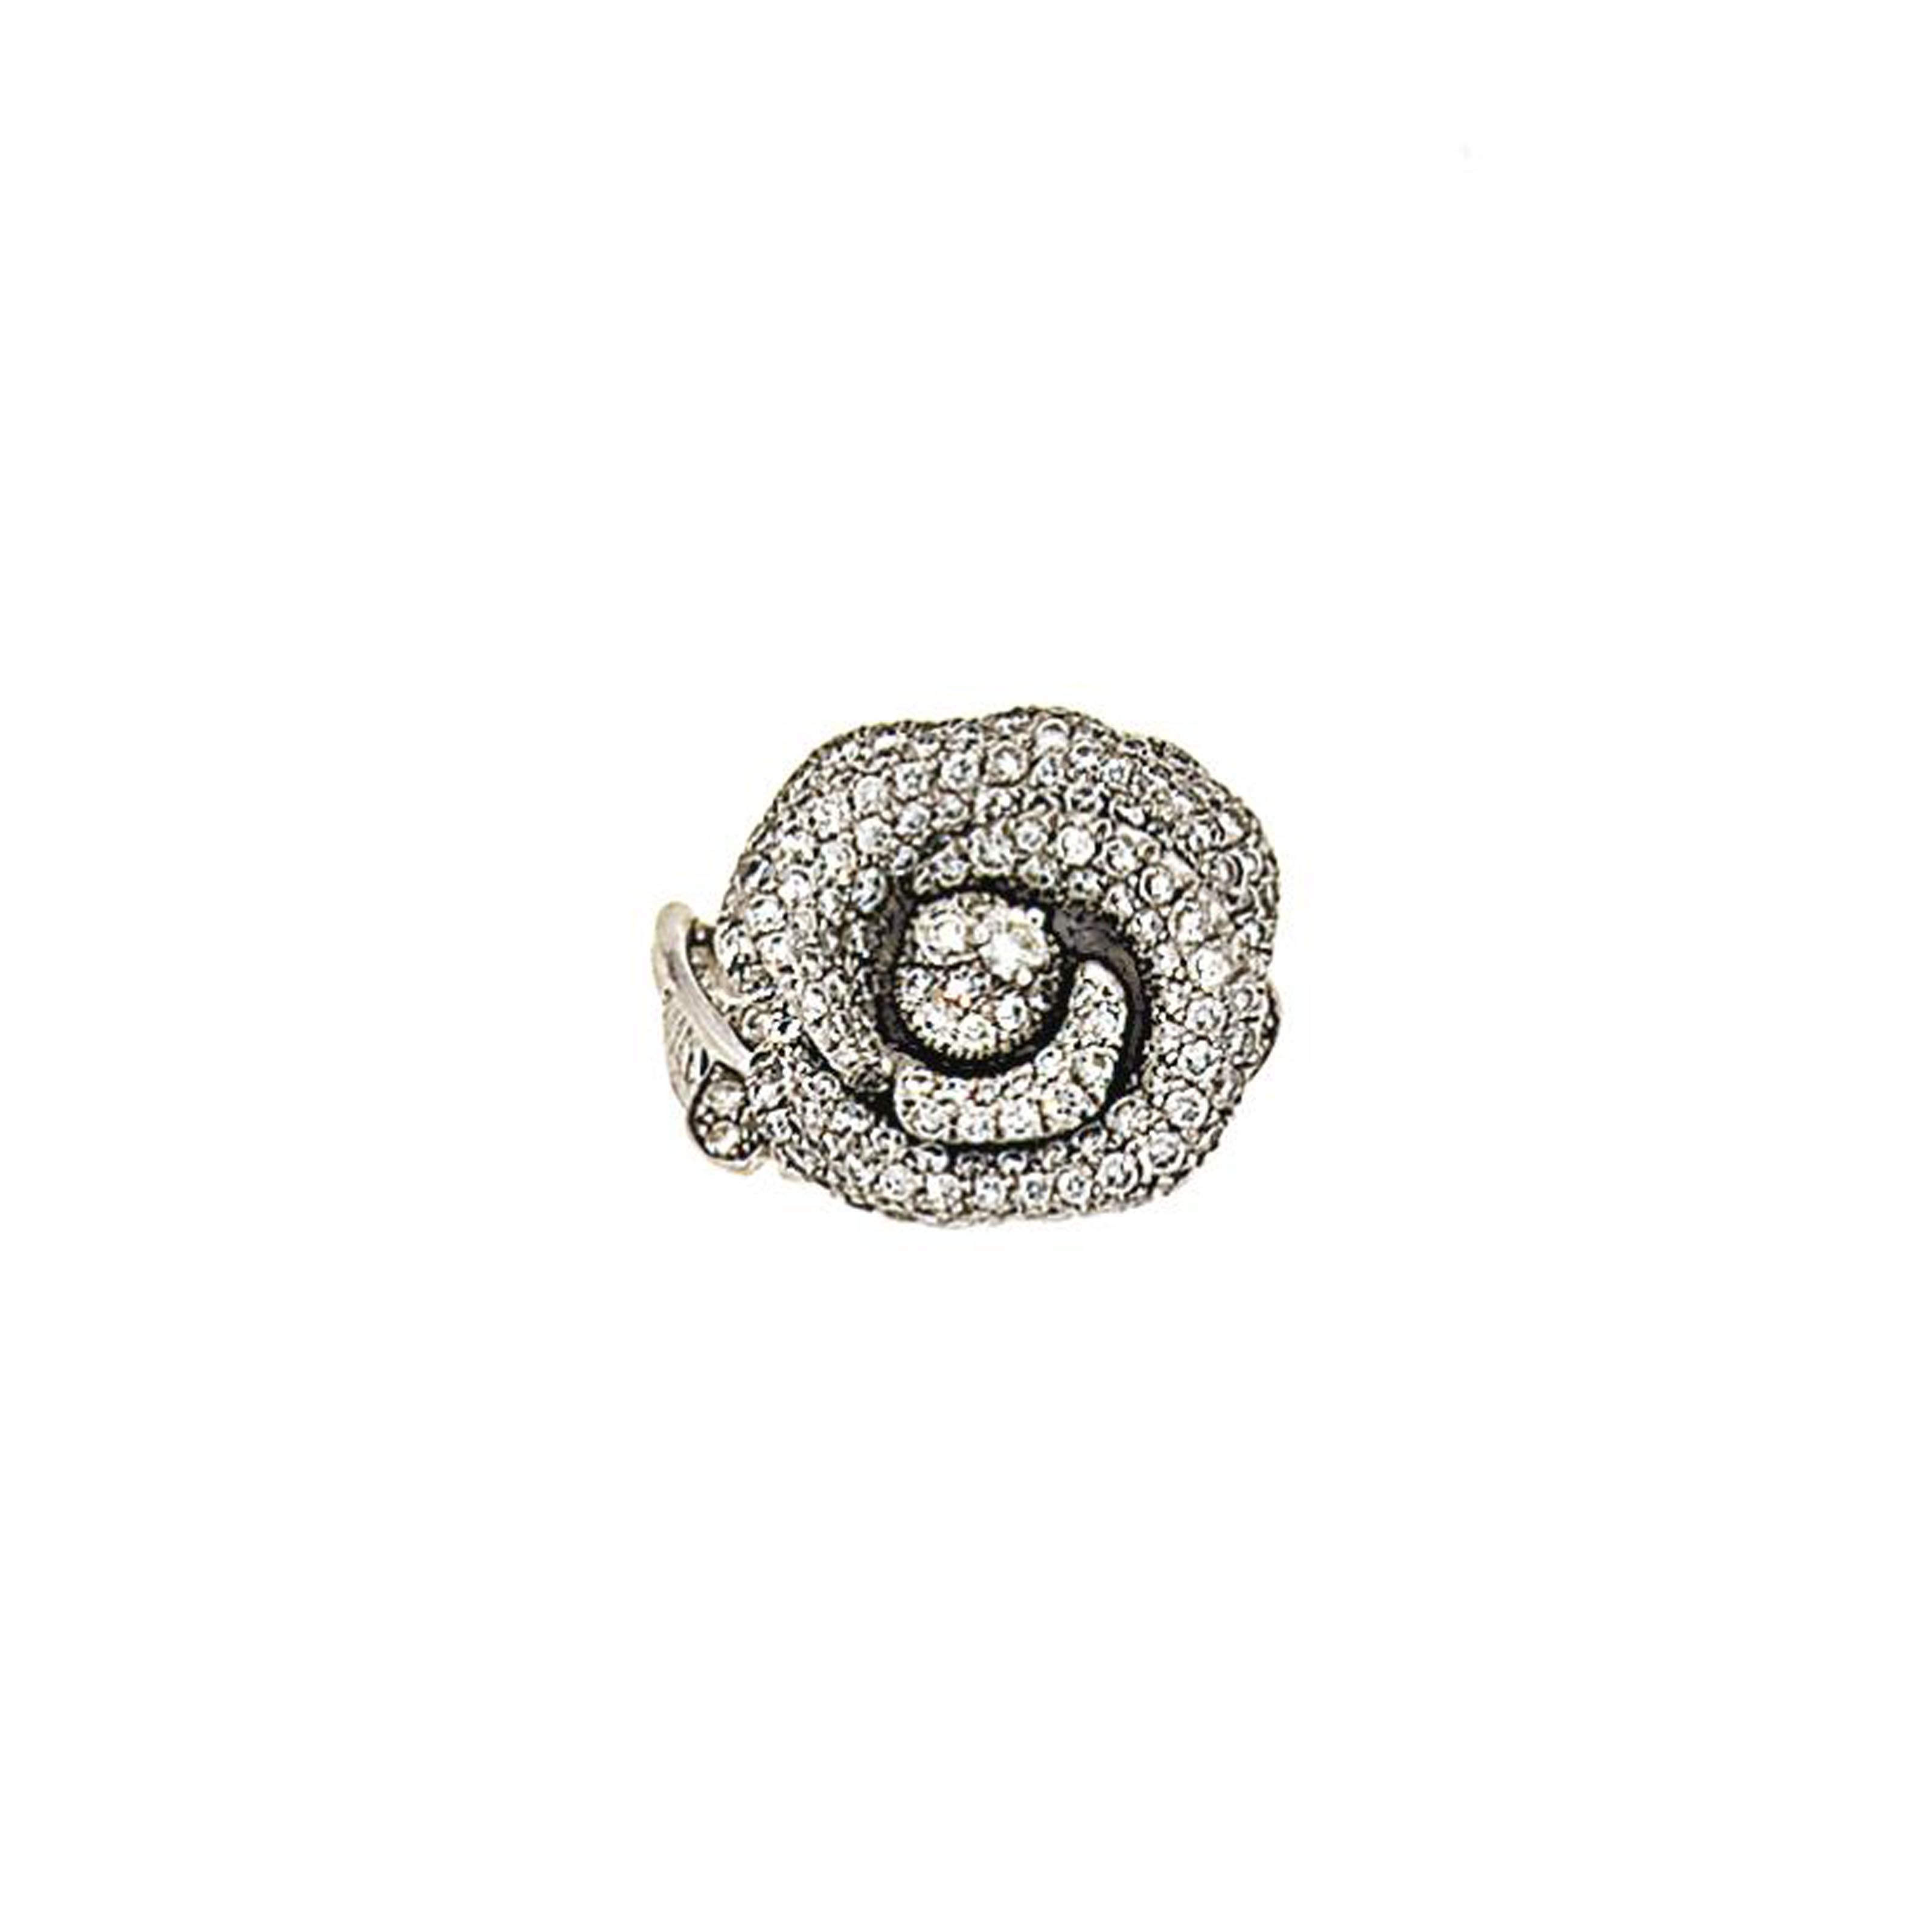 A diamond 'Rose' ring, by Chri